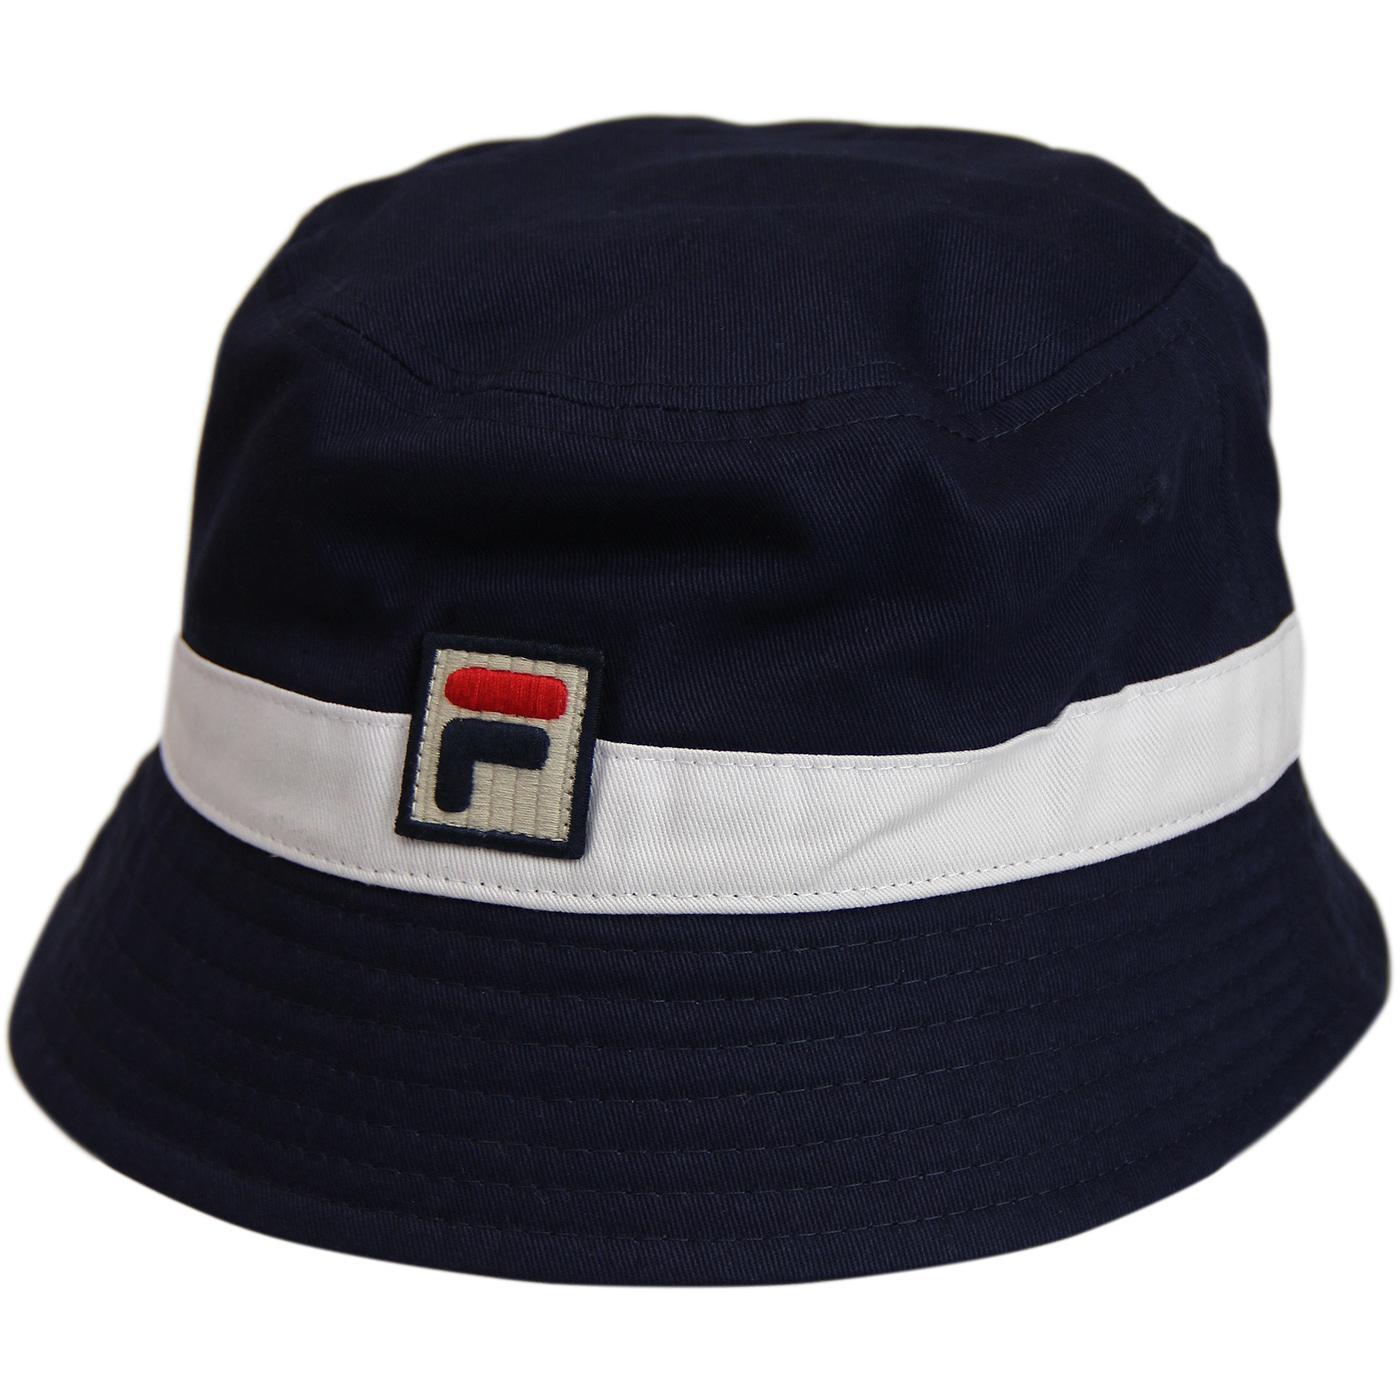 Basil FILA VINTAGE Retro 1990s Bucket Hat (P/W)